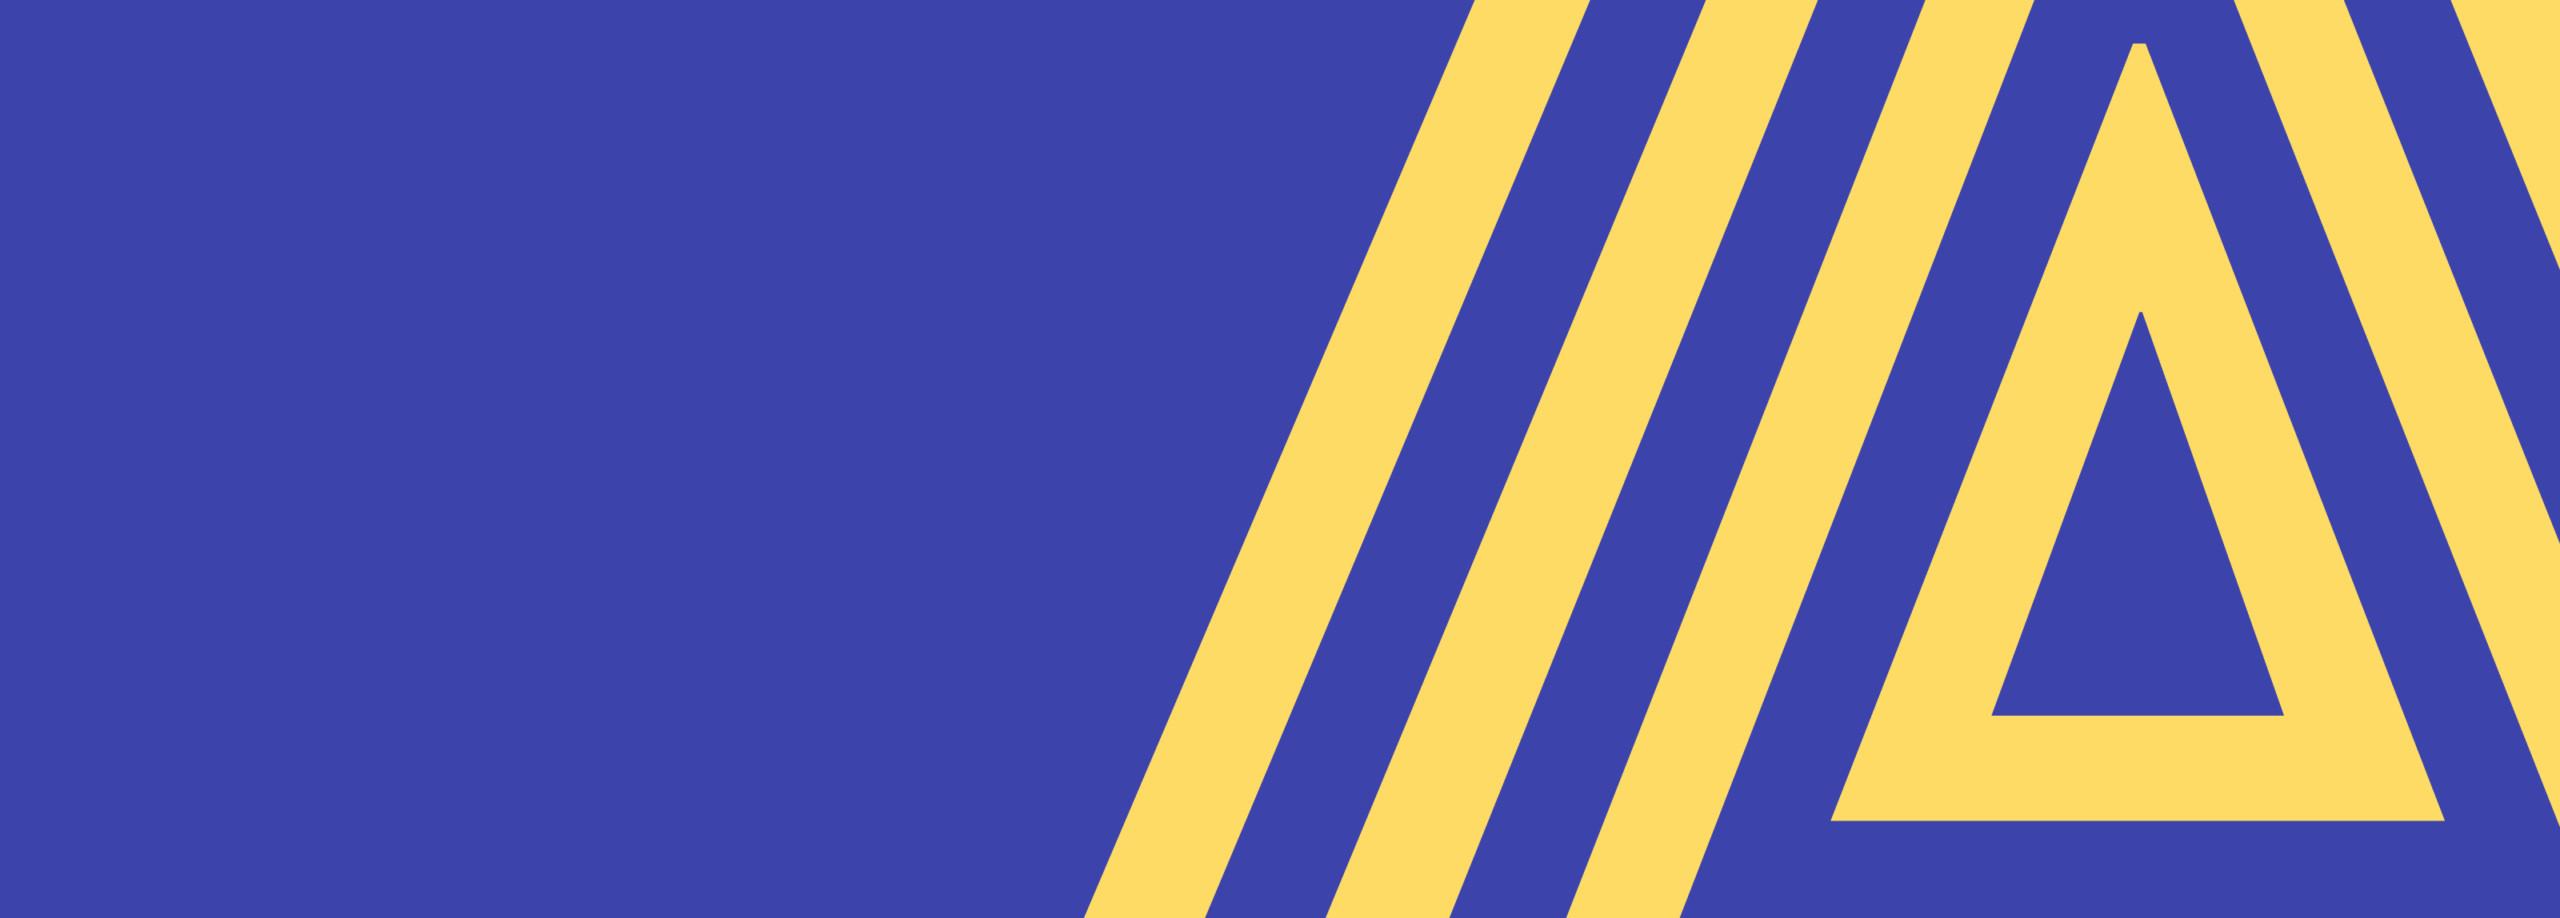 Academias banner